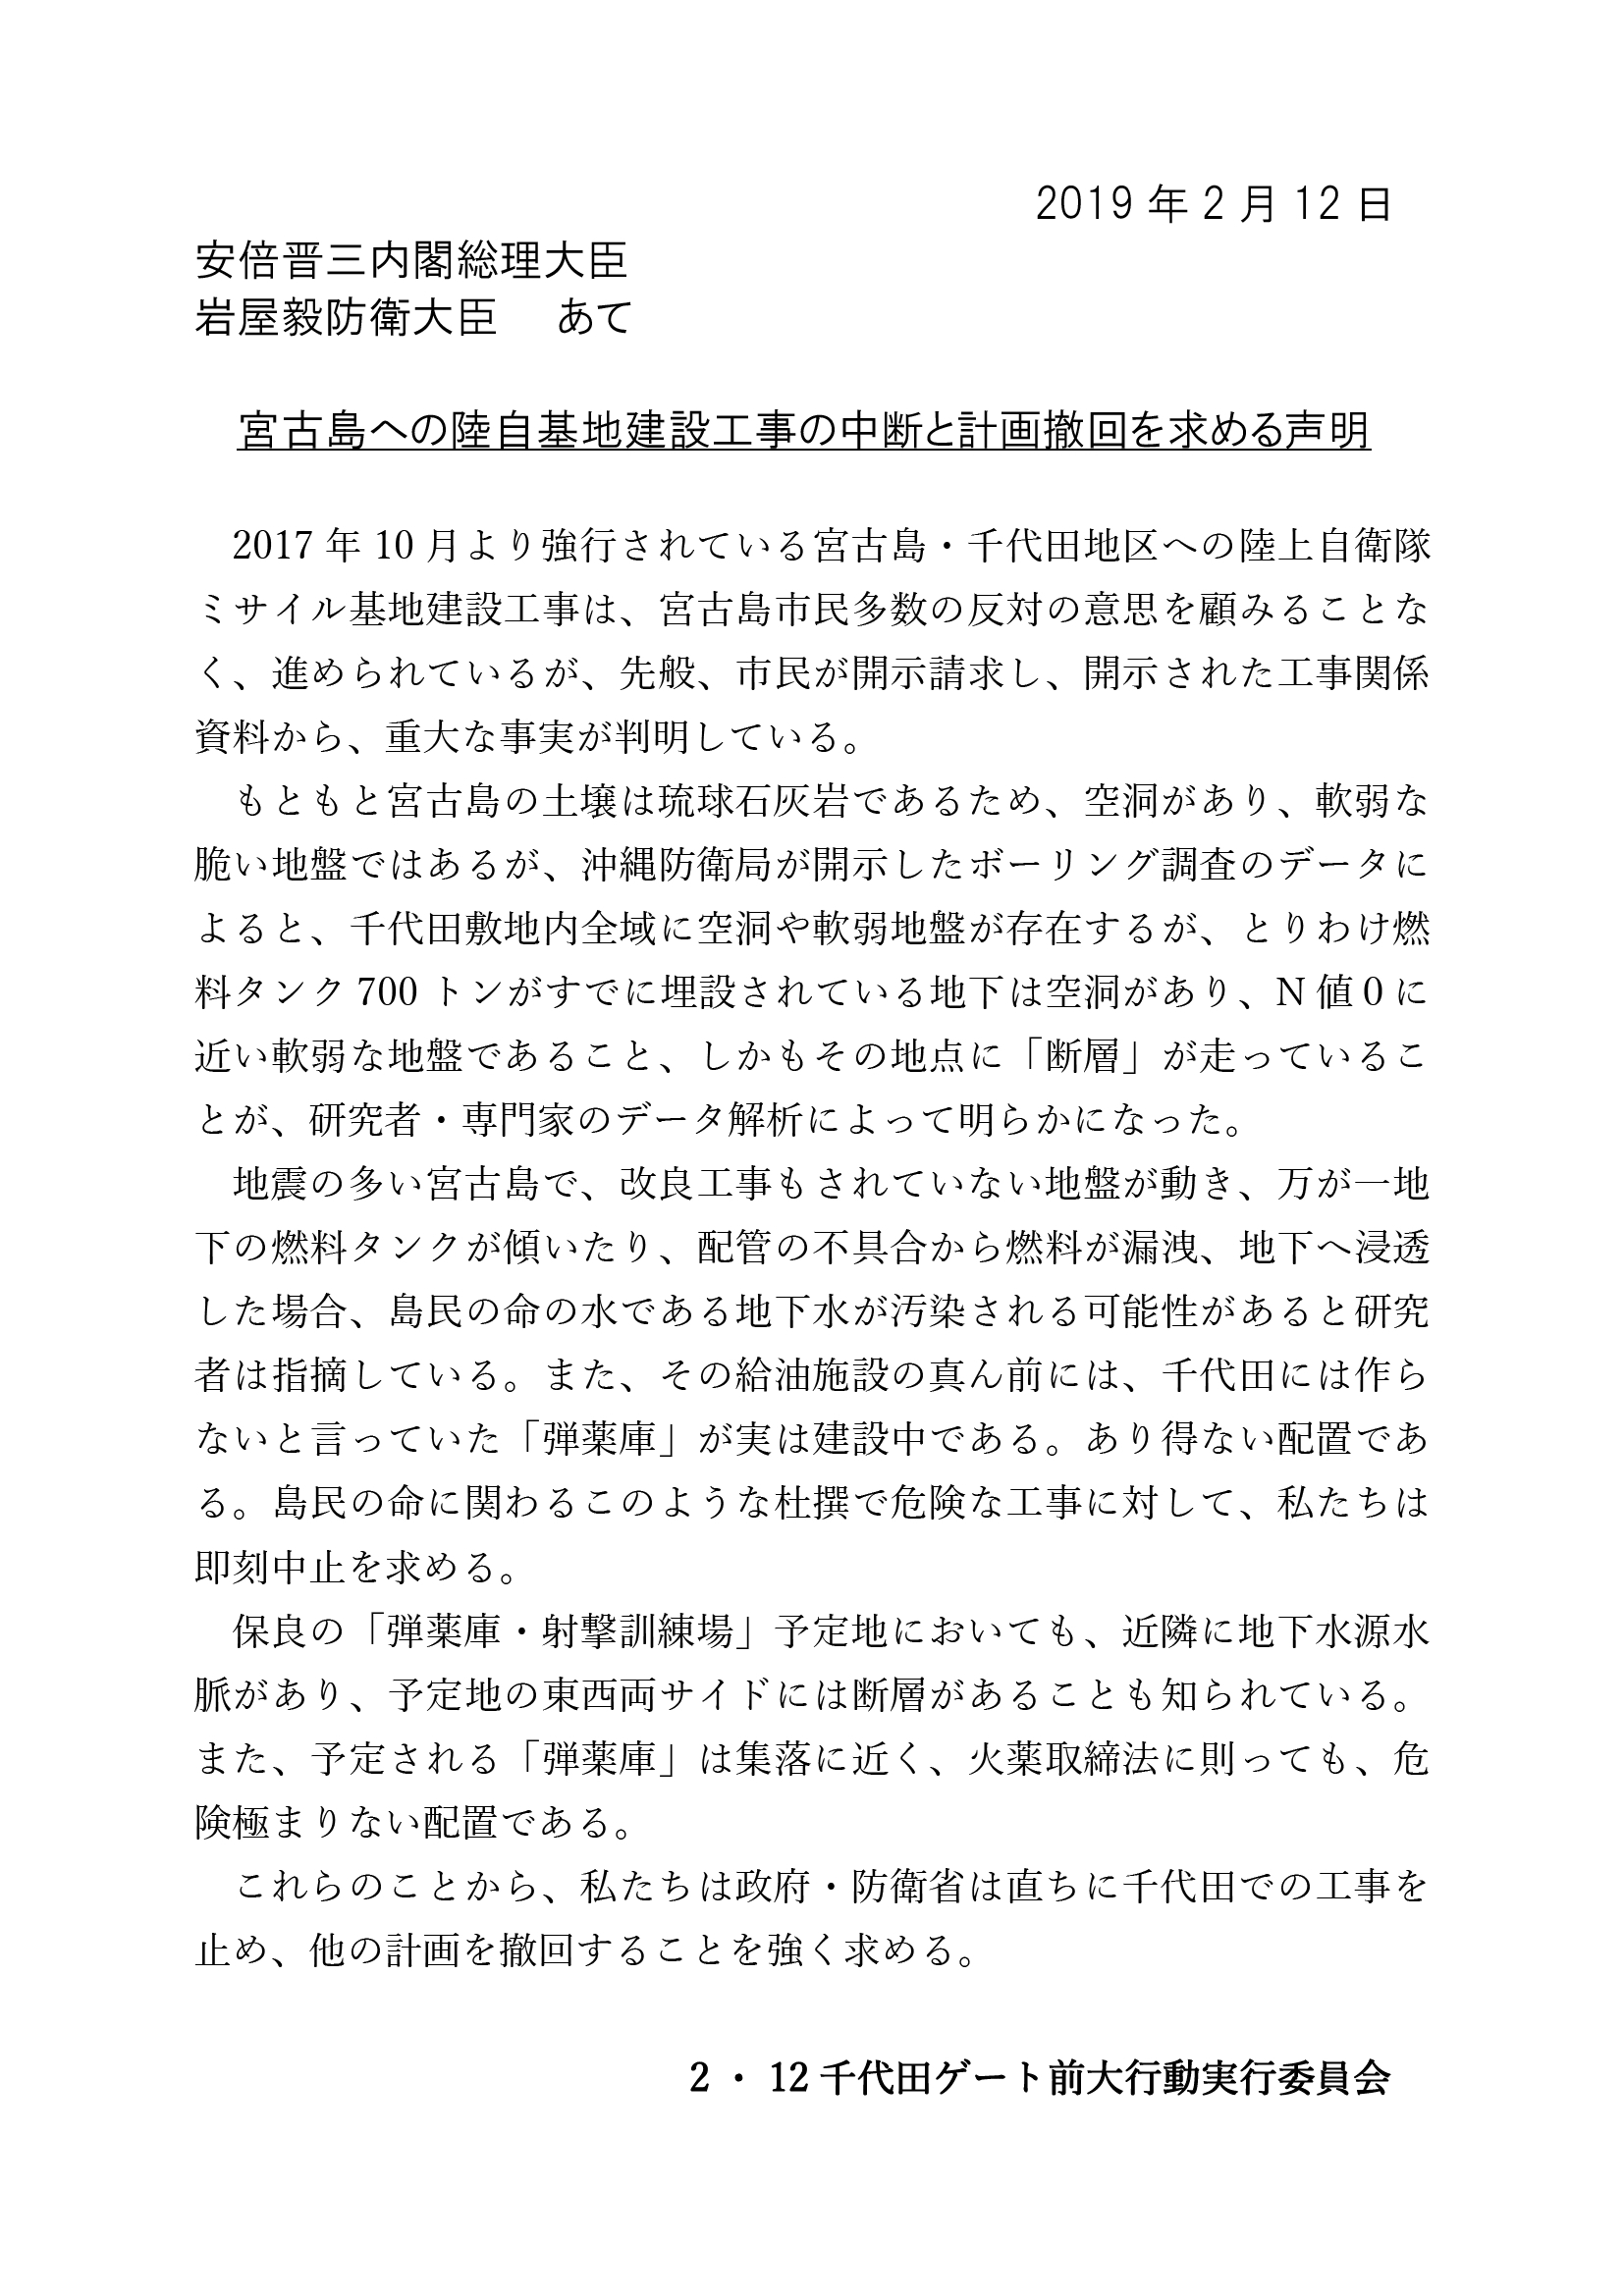 212千代田ゲート前大行動声明